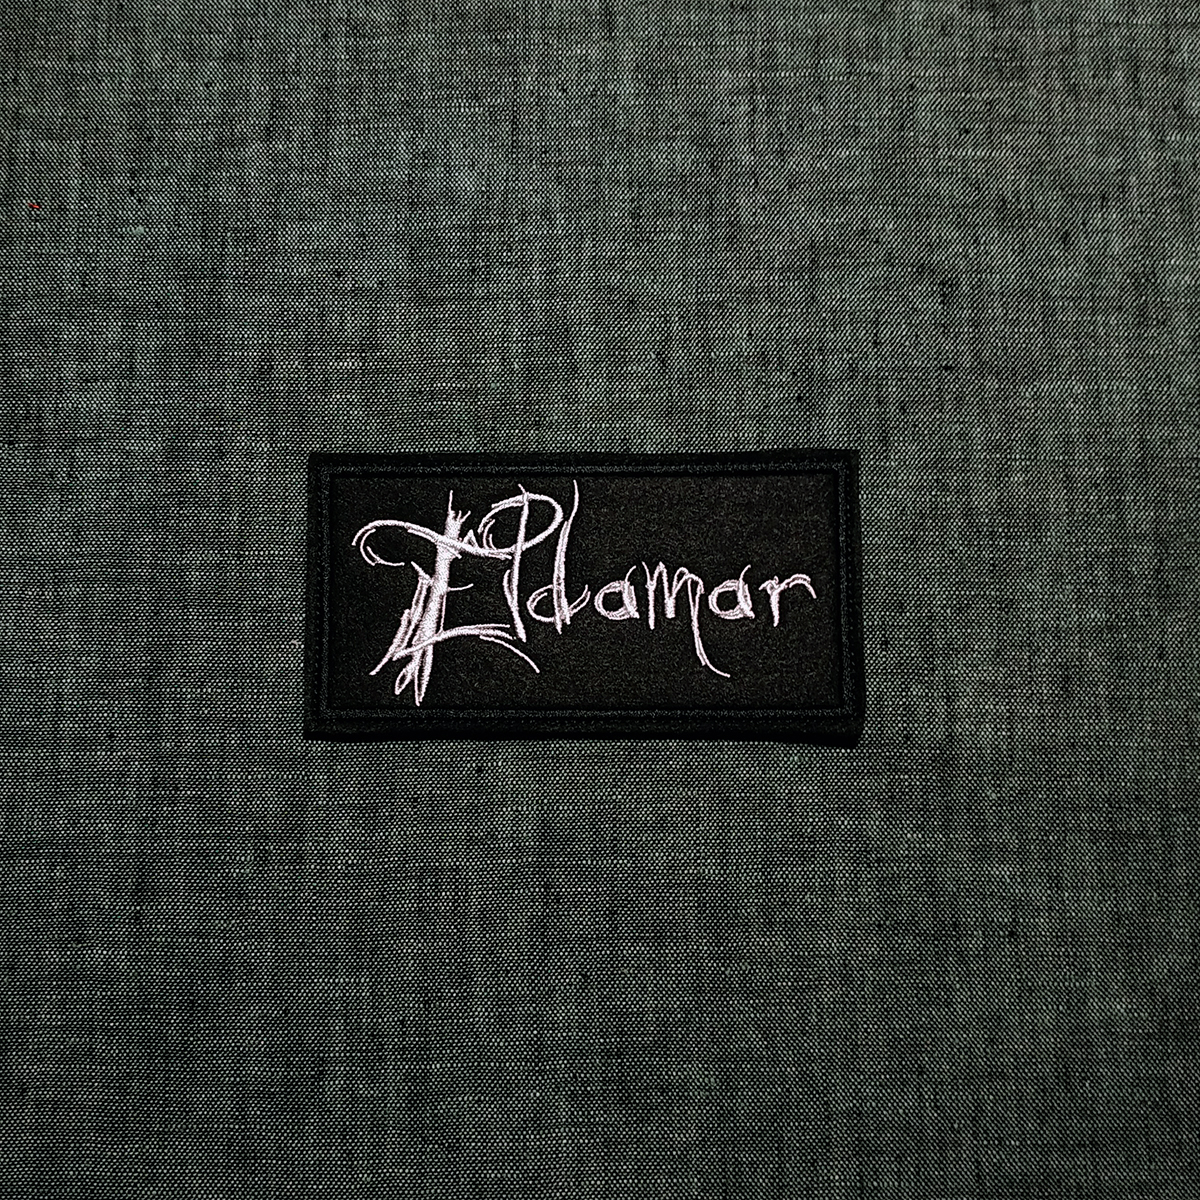 Patch Eldamar Black Metal band.